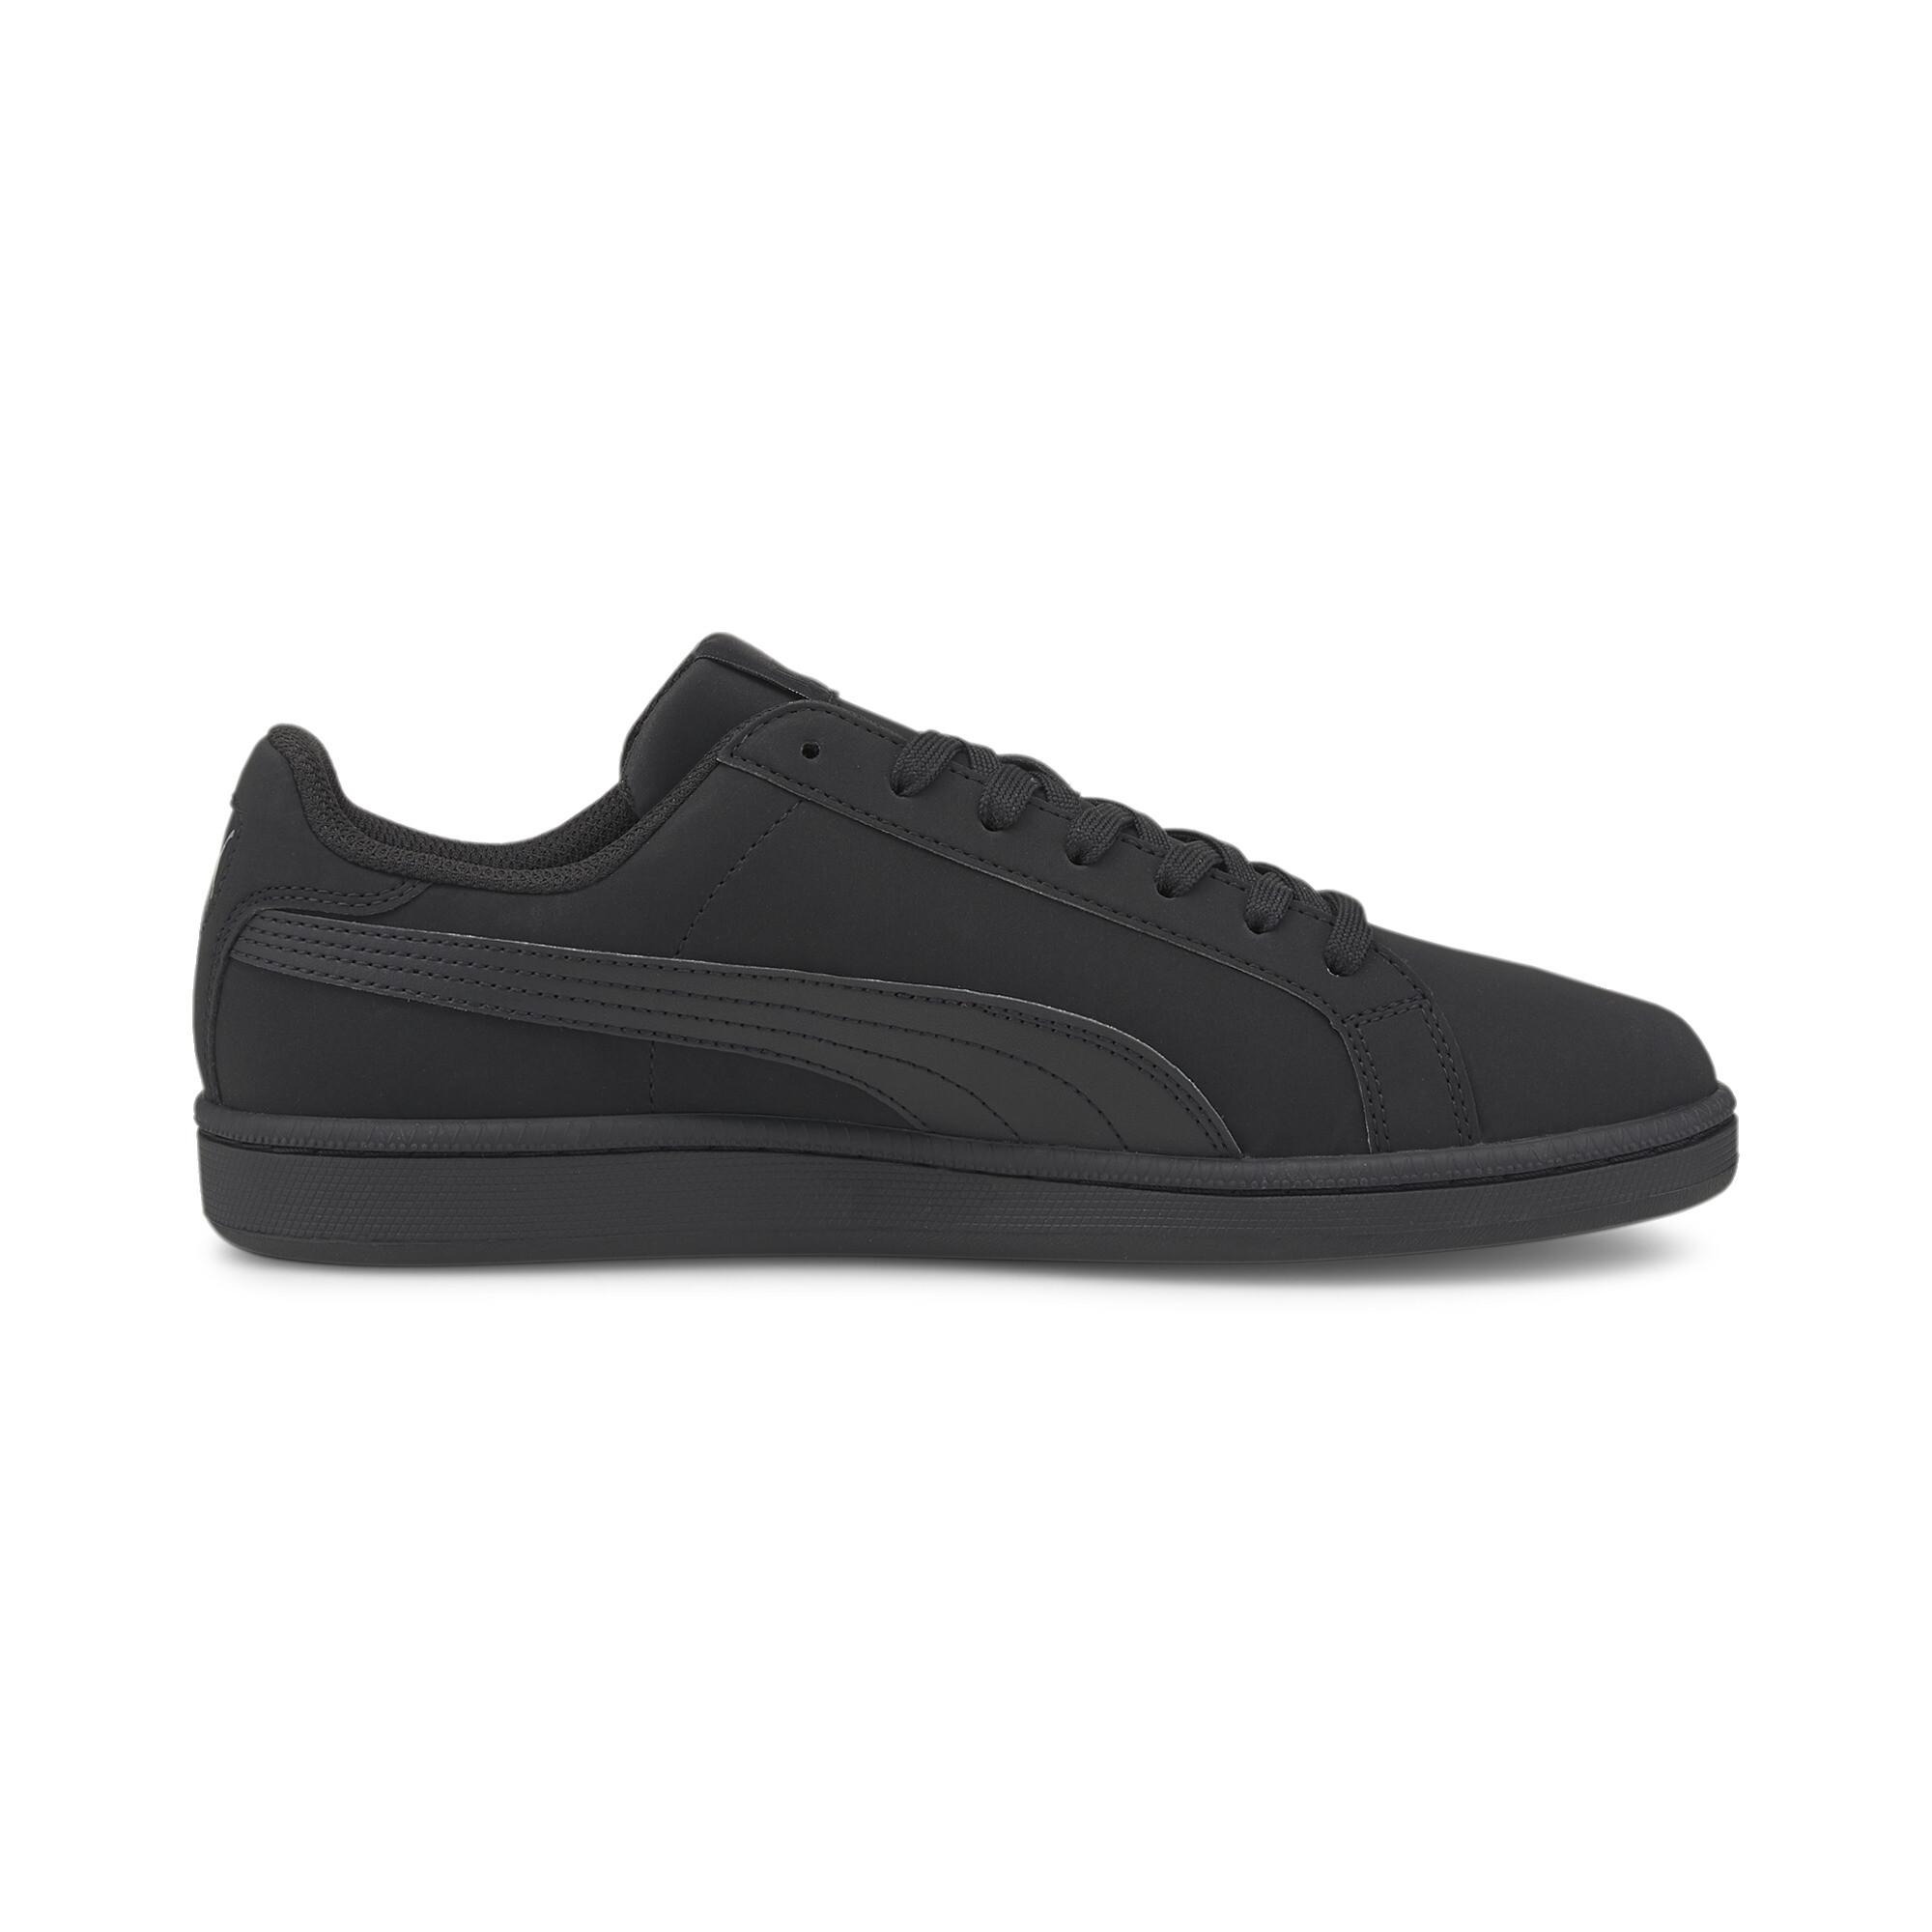 Indexbild 22 - PUMA Smash Buck Sneaker Unisex Schuhe Sport Classics Neu